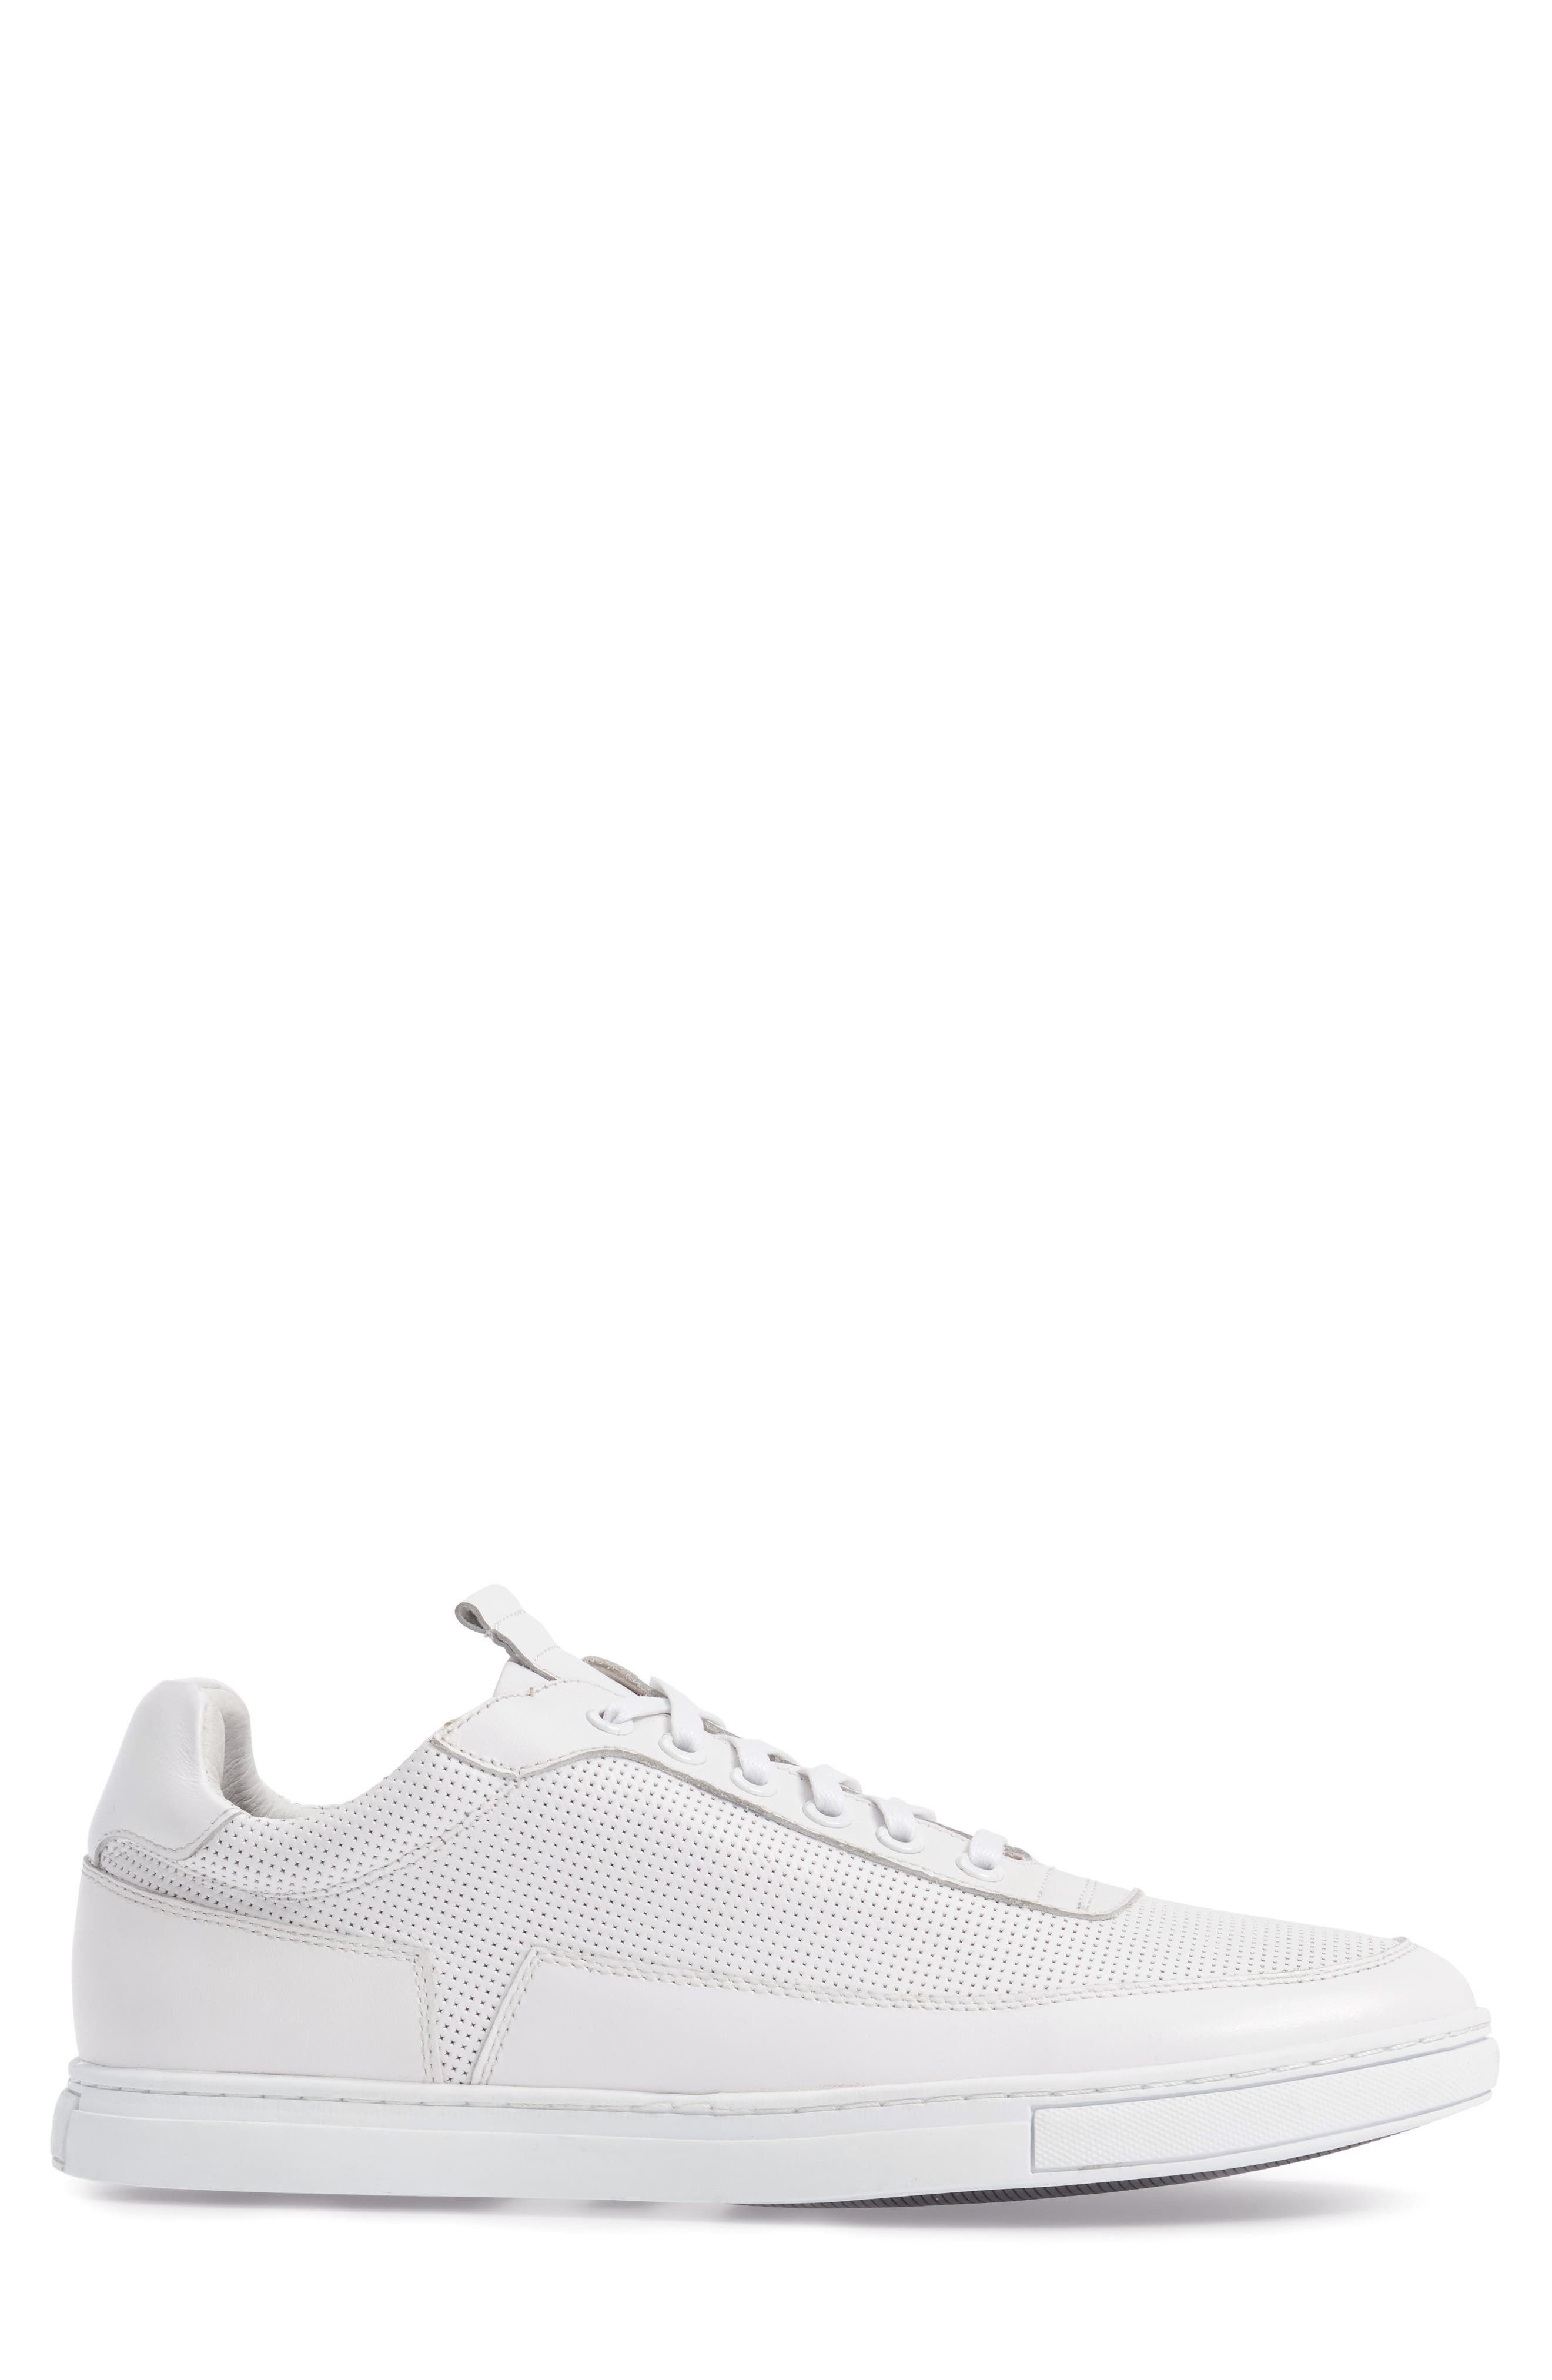 Alternate Image 3  - Zanzara Harmony Sneaker (Men)